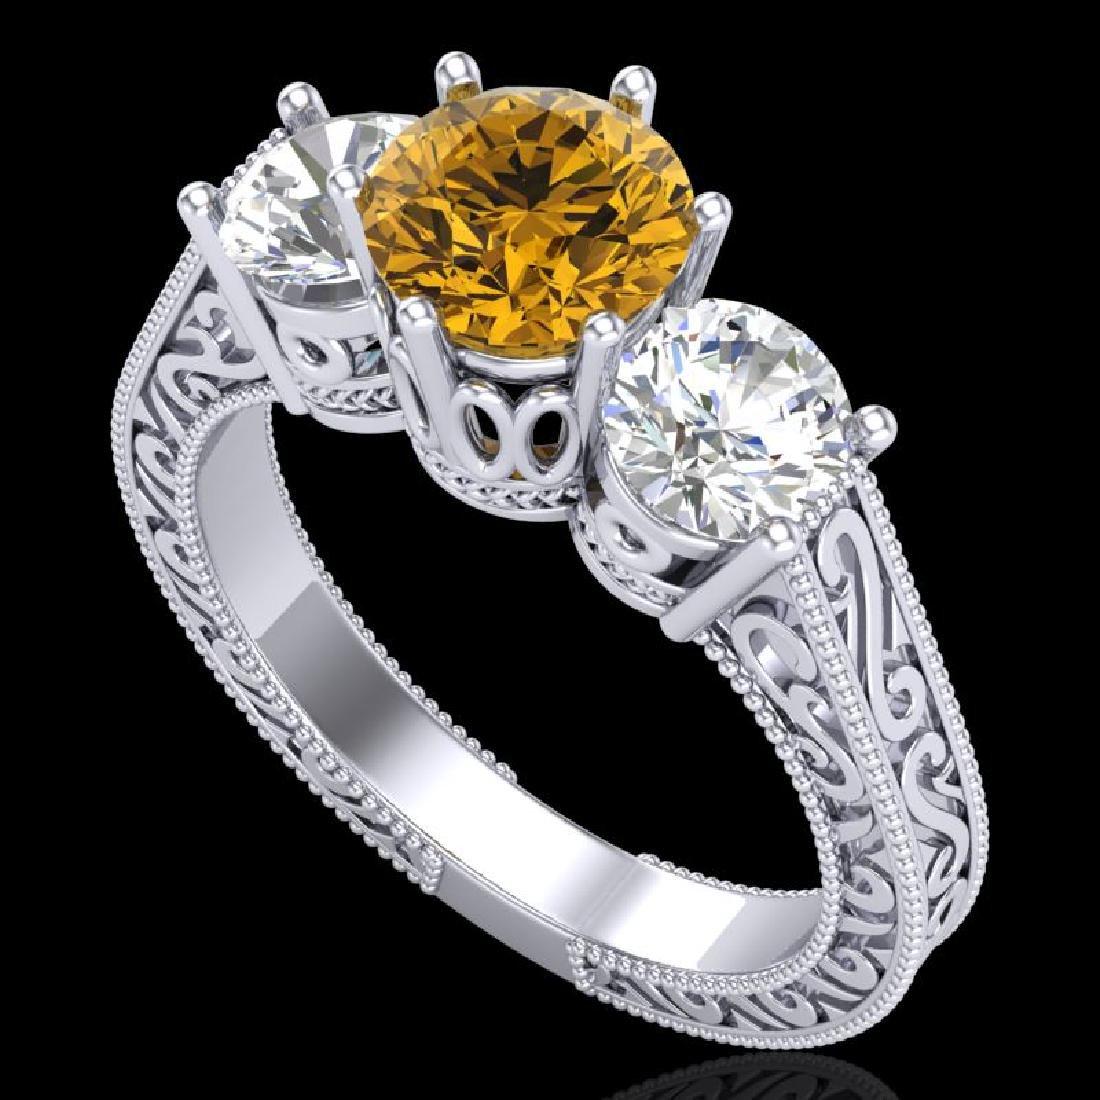 2.01 CTW Intense Fancy Yellow Diamond Art Deco 3 Stone